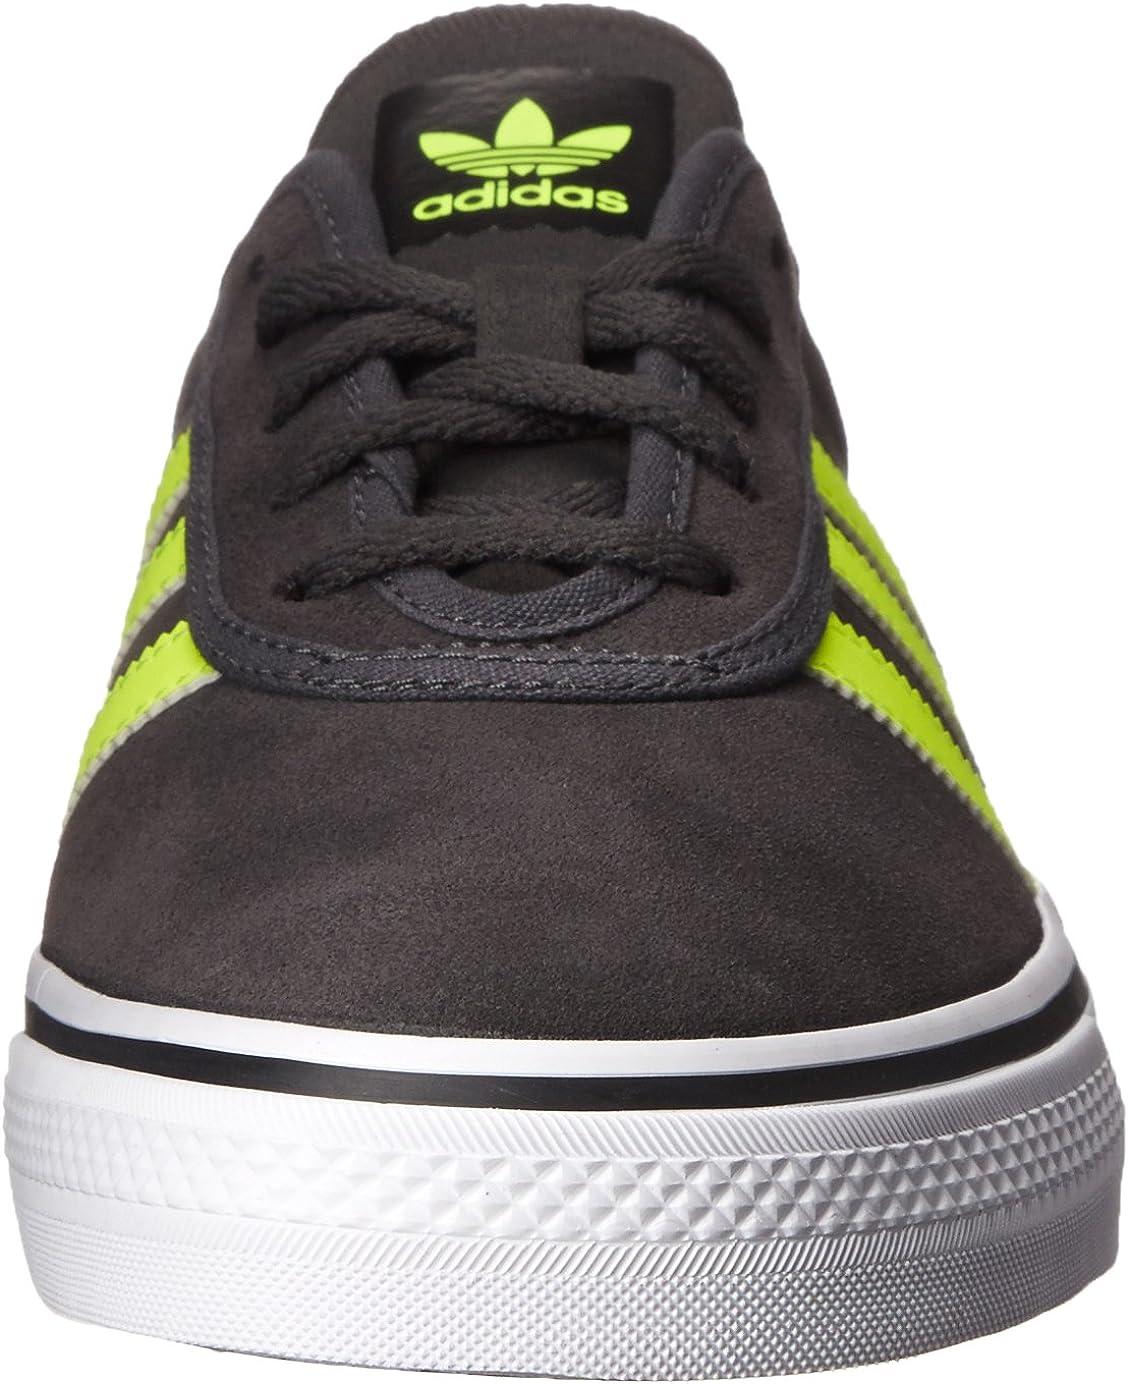 adidas Originals Men's Adi-Ease, Night Cargo/Core Black/Gum Dark Grey Heather Solid Grey Solar Yellow Black